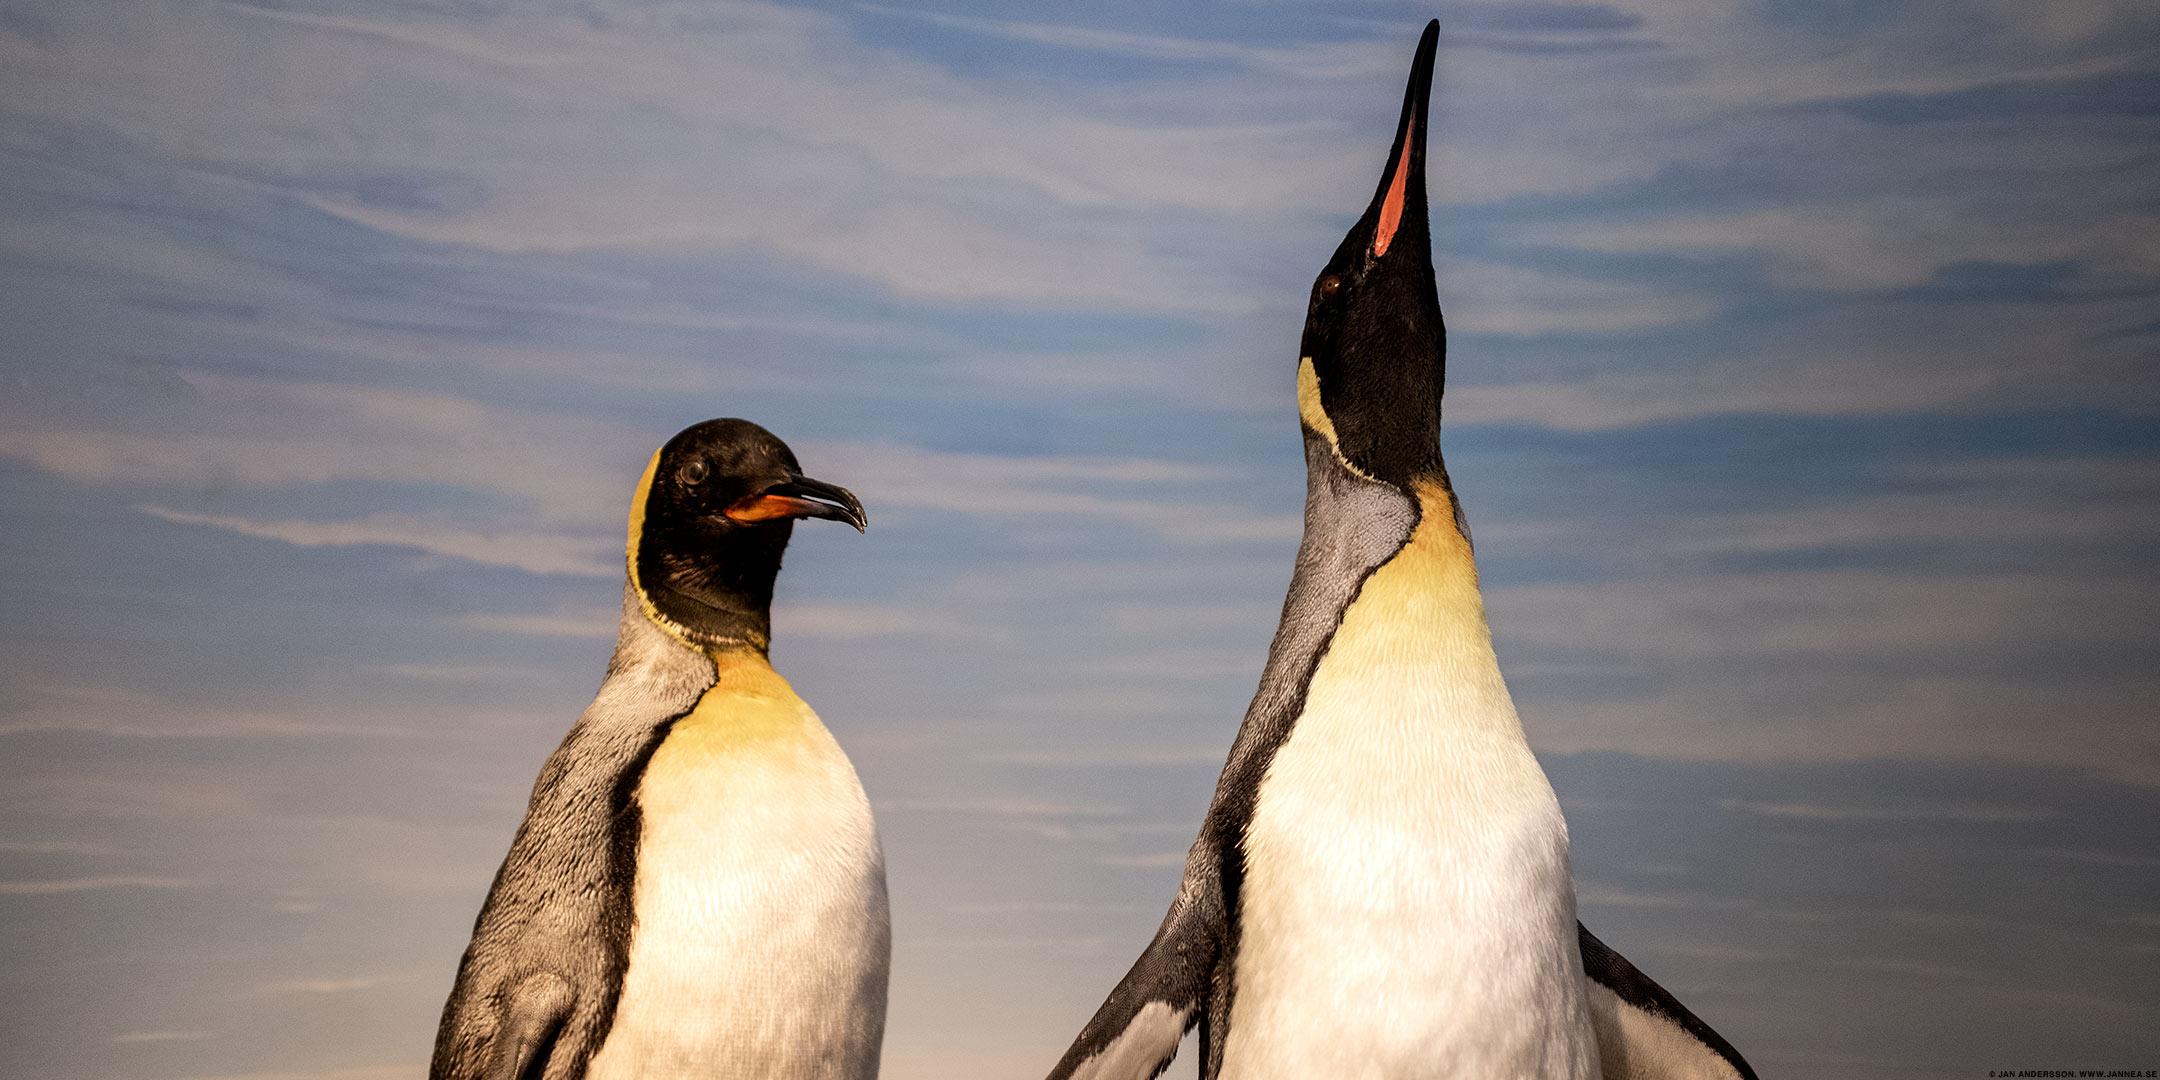 Pingviner i glasmontrar |© Jan Andersson